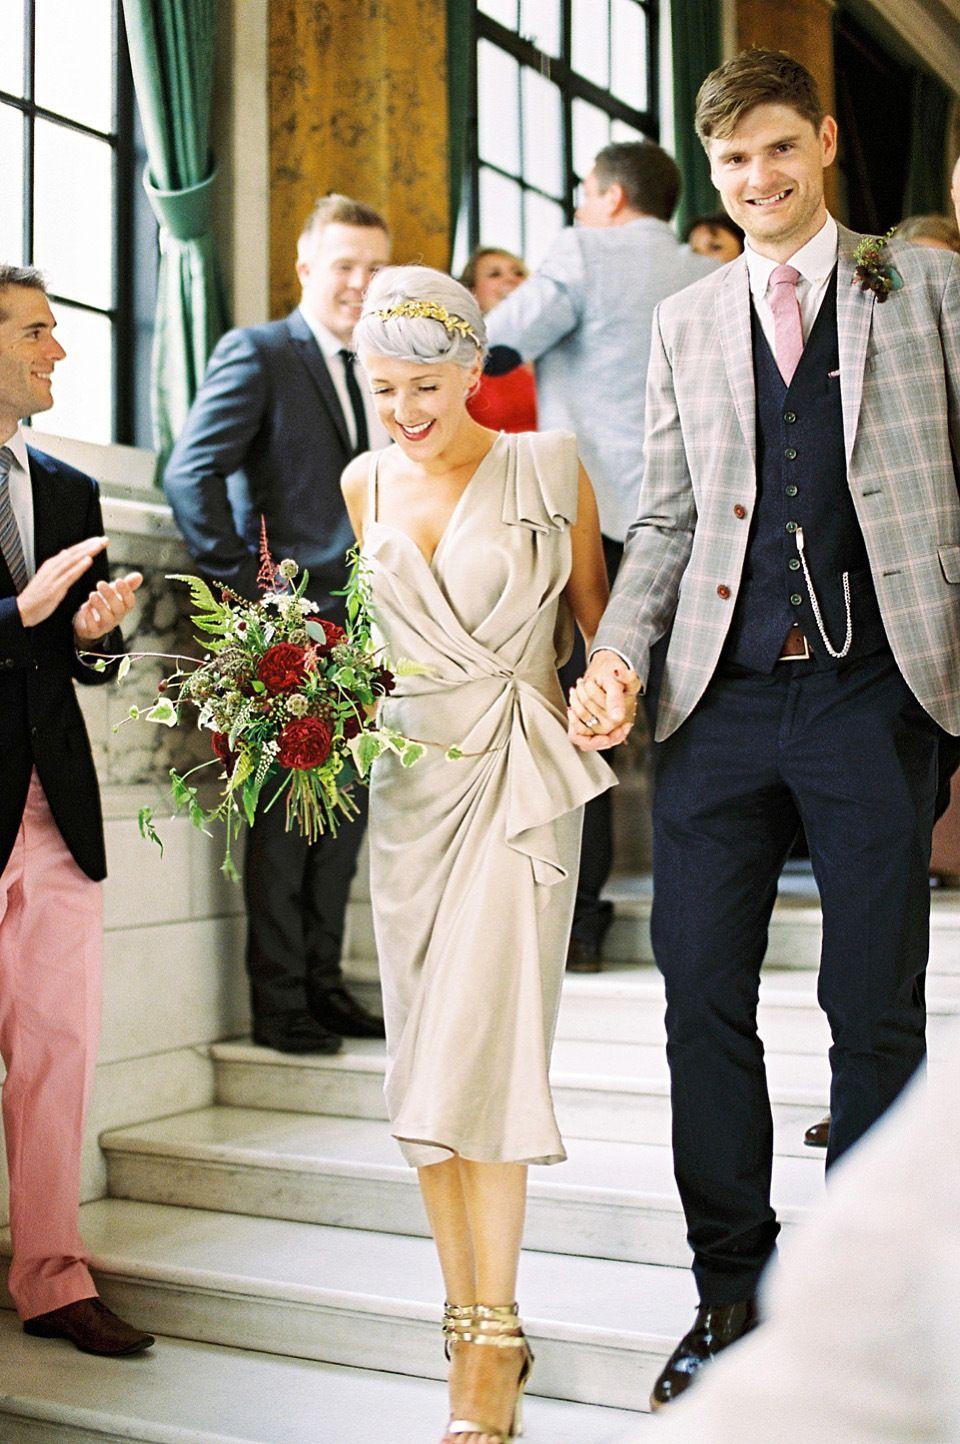 A fashion designer bride and her childhood sweetheart groom bodas